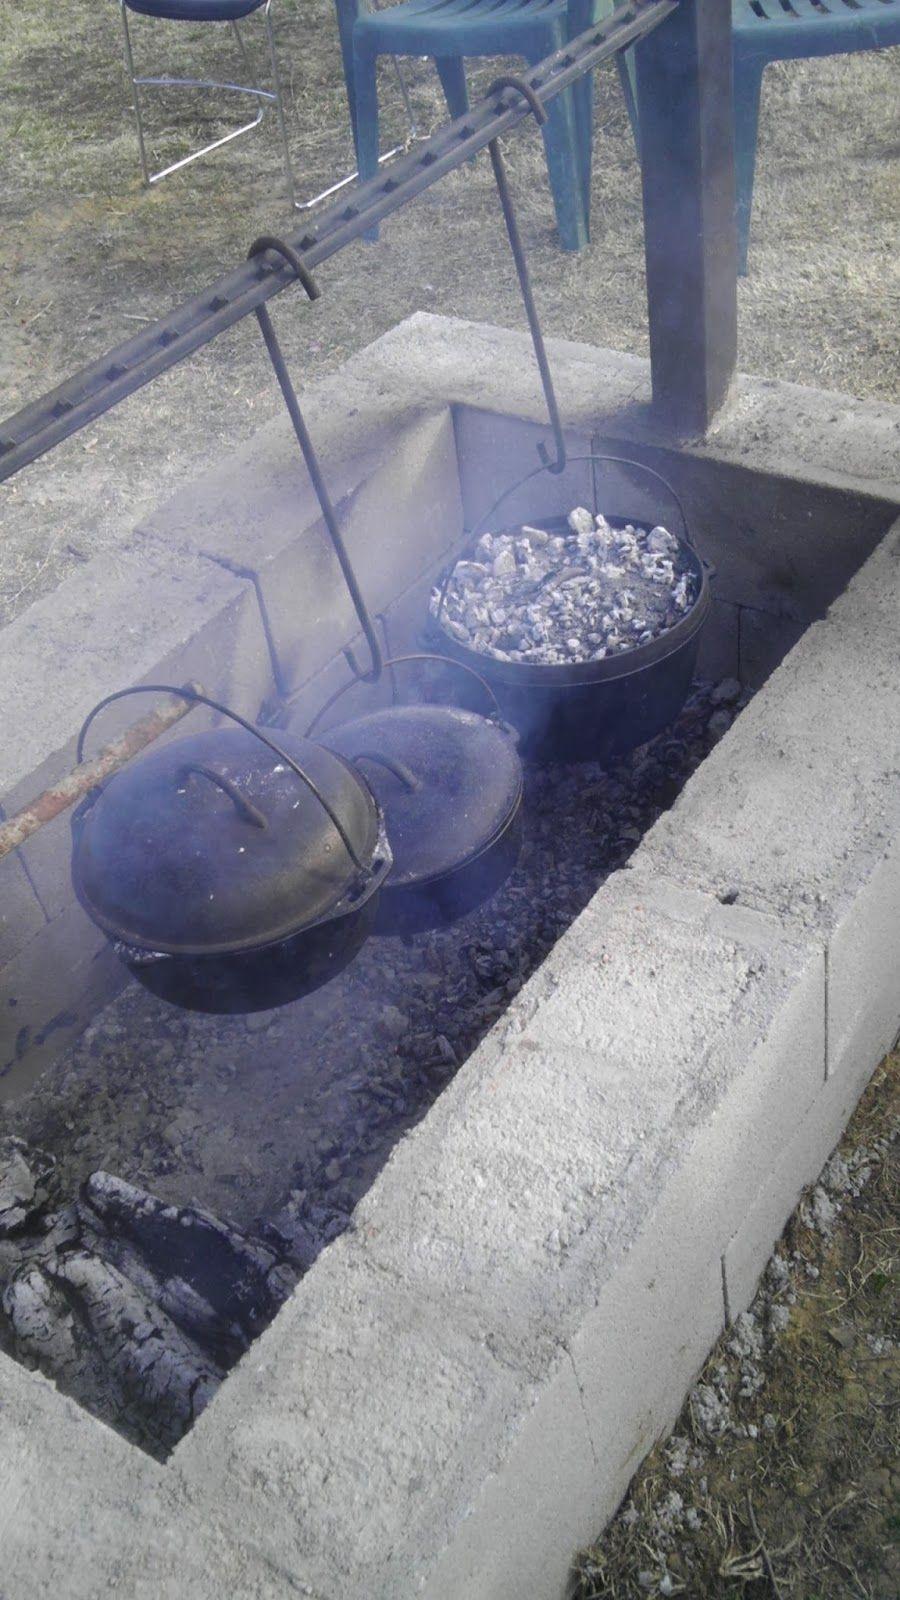 Redneck Outdoor Kitchen Ideas Html on redneck pool theatre, redneck swimming pool, slate tile kitchen backsplash ideas, redneck shelving, redneck fence ideas, redneck plumbing repairs, redneck furniture ideas, redneck wood-burning furnace outdoor, redneck fire pit ideas,